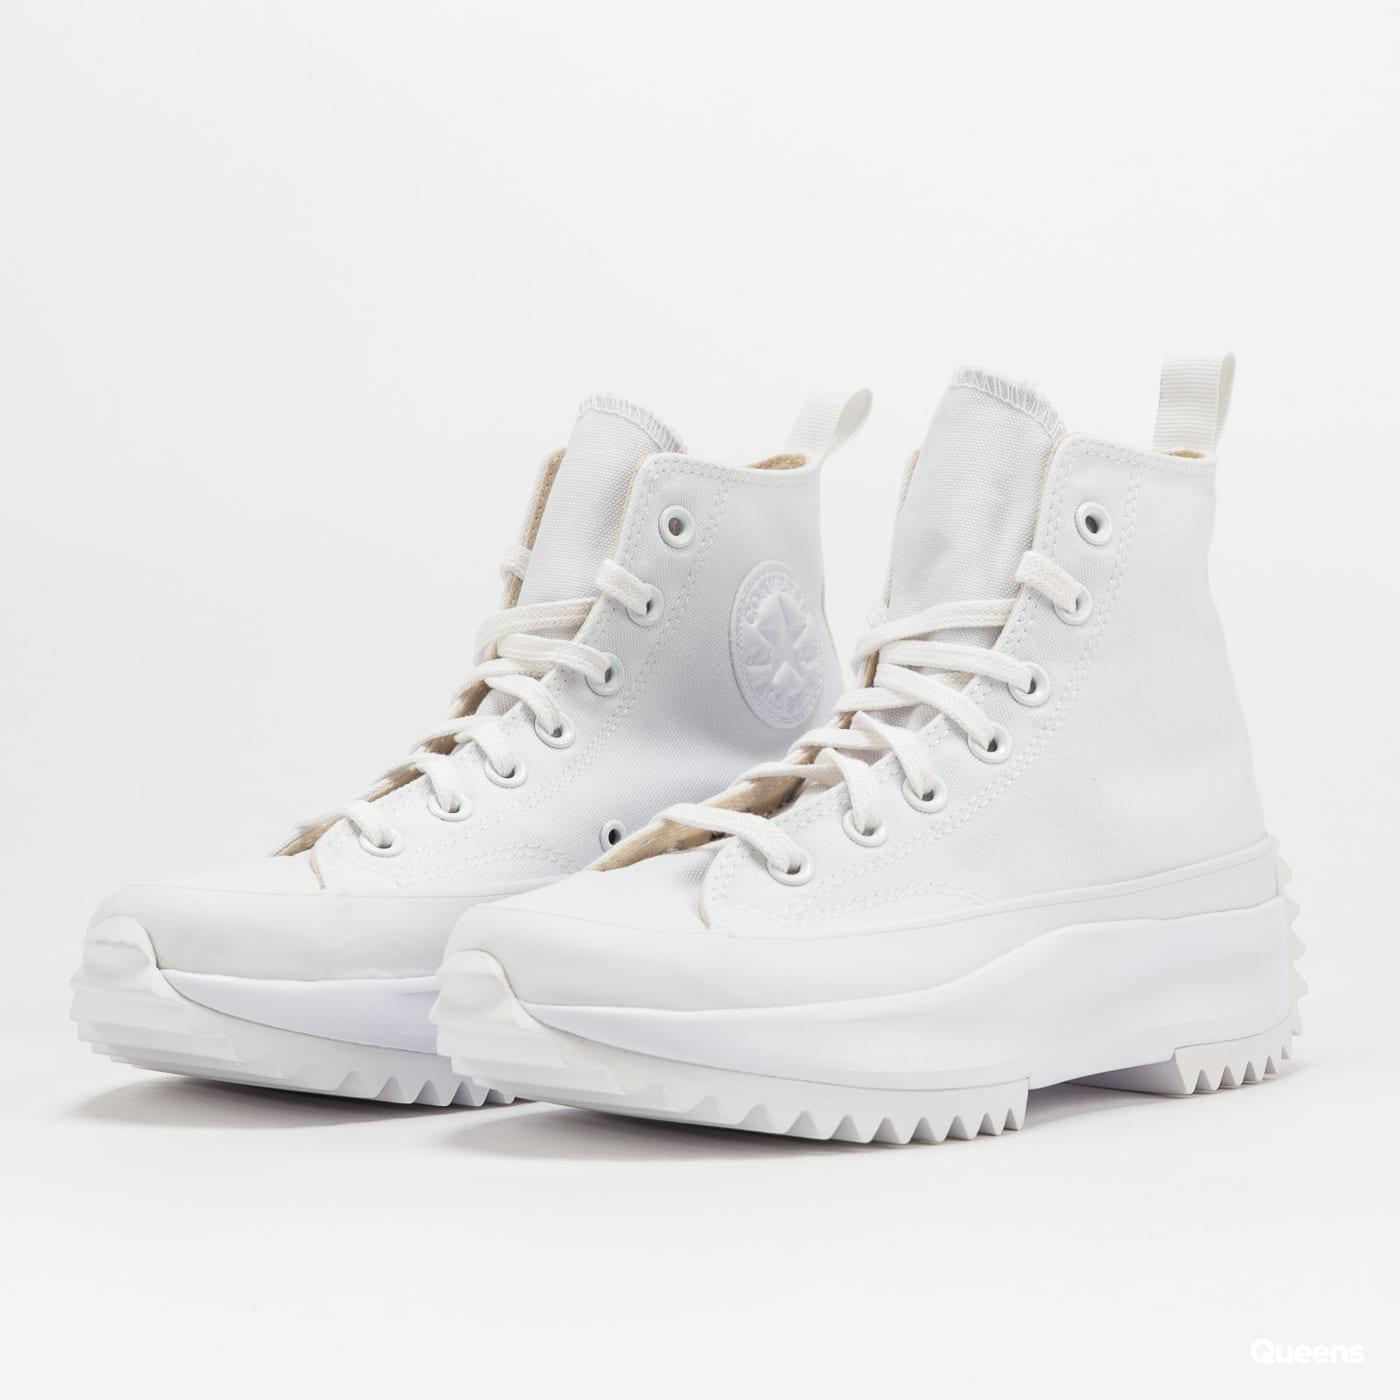 Converse Run Star Hike Hi white / white / white